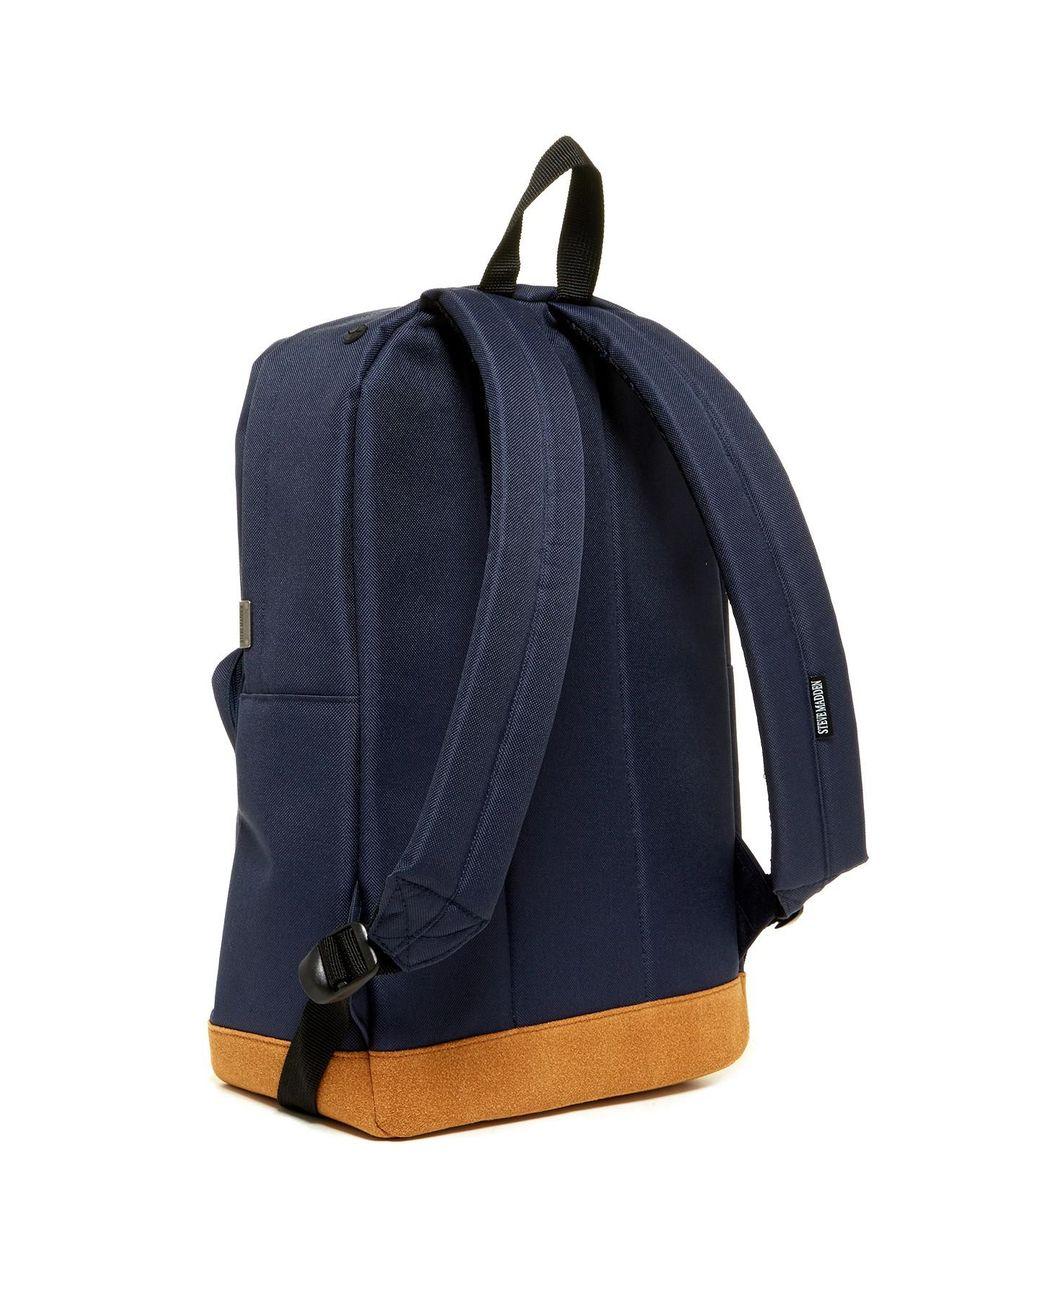 689894e709 Steve Madden Solid Classic Sport Backpack in Blue for Men - Lyst